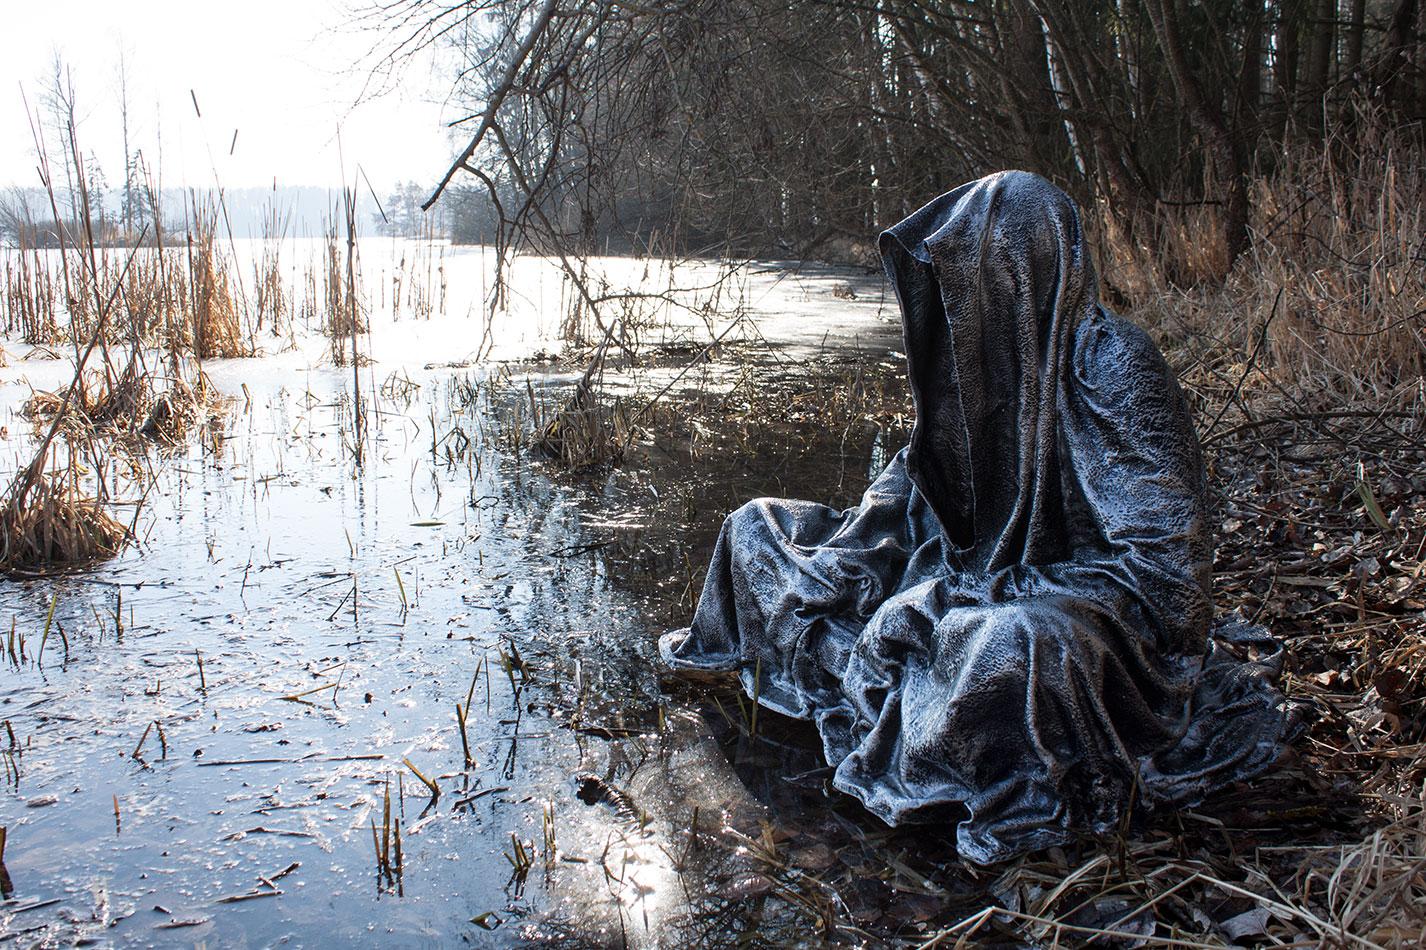 waldviertel-fish-pond-lake-lower-austria-contemporary-art-design-photography-arts-antique-guardians-of-time-manfred-kili-kielnhofer-7639